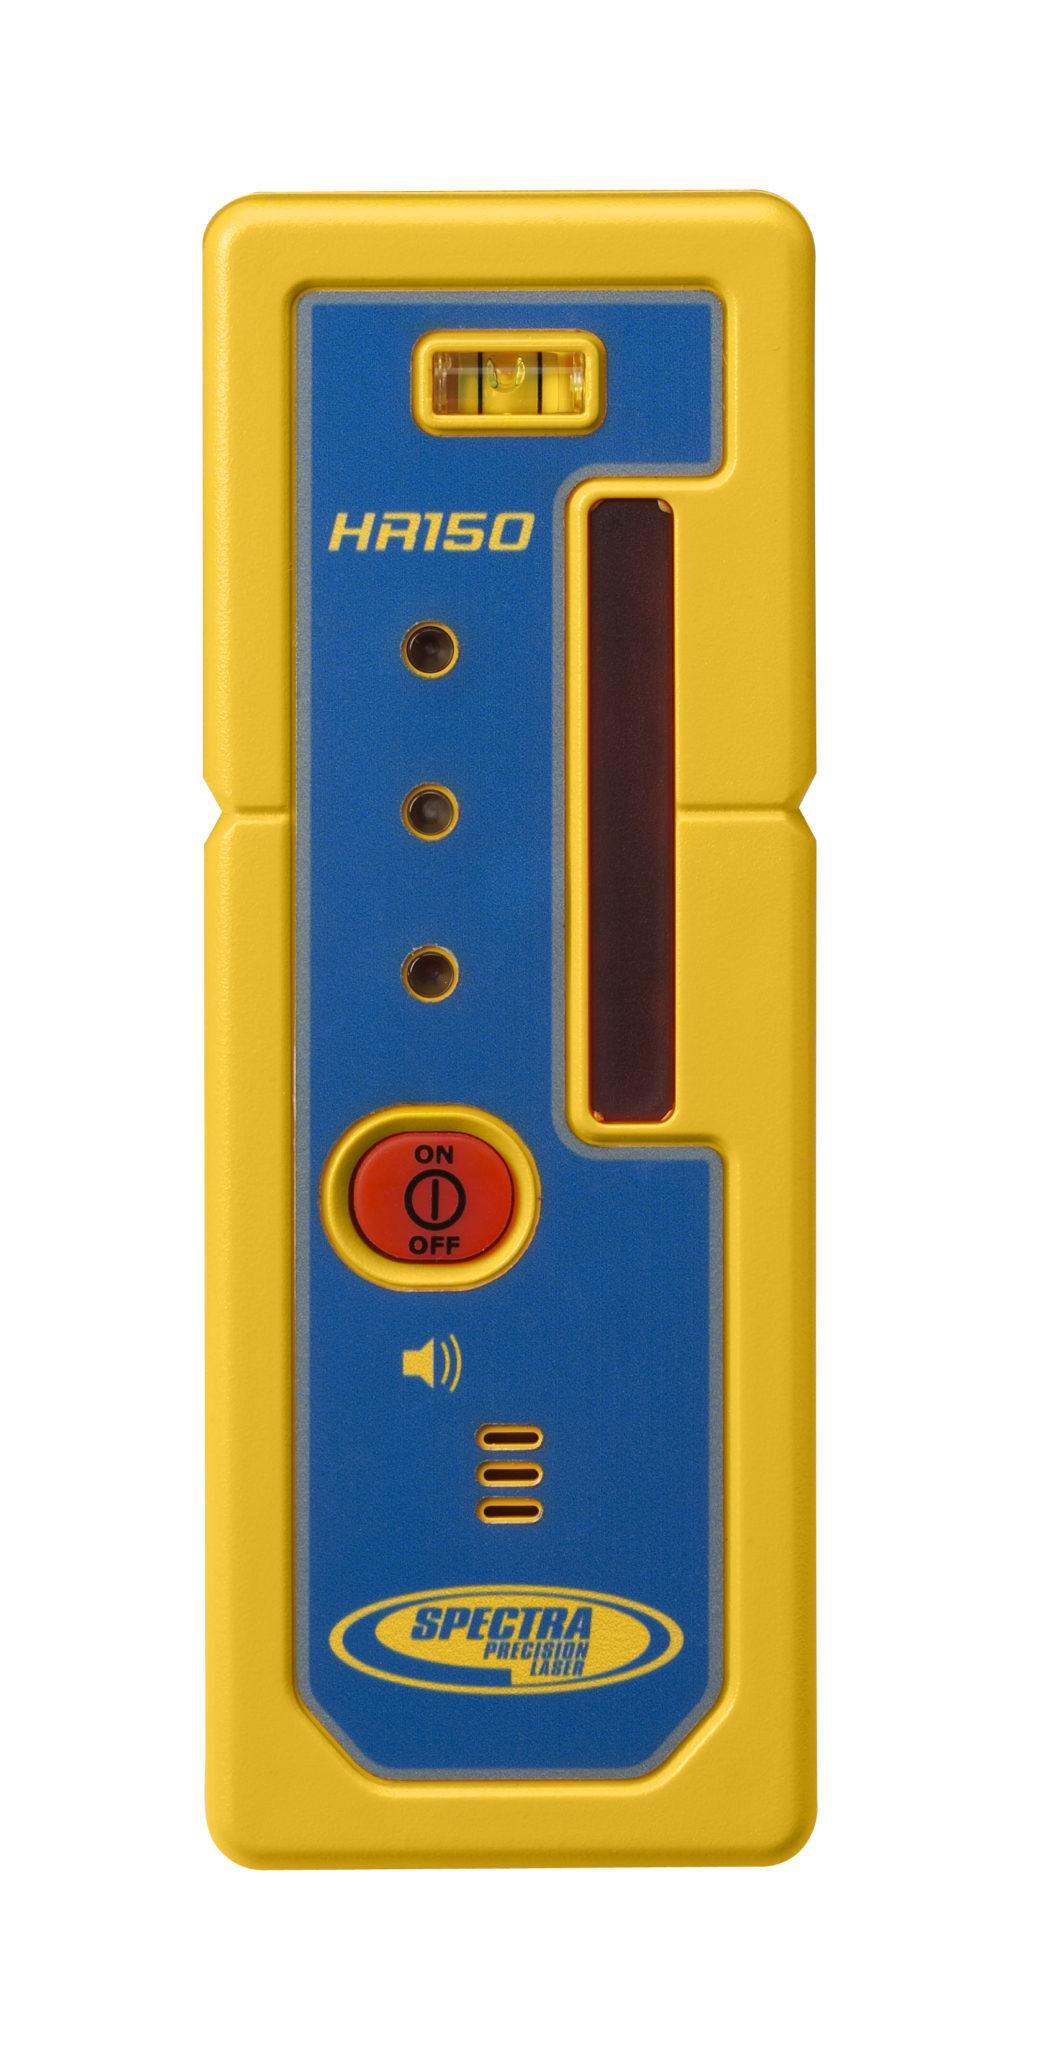 HR150